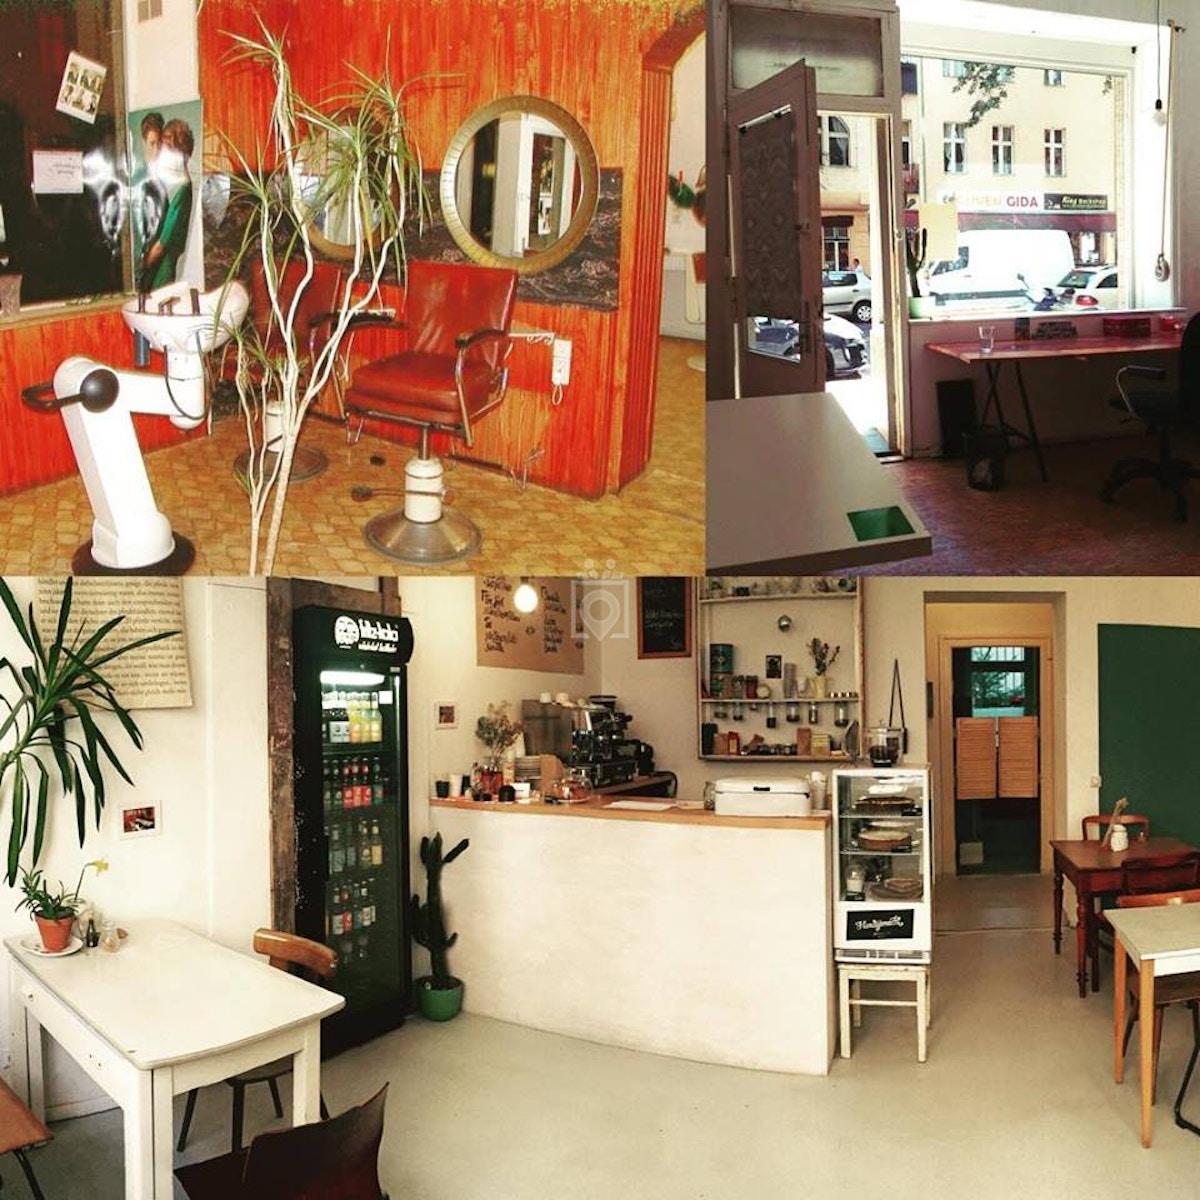 Extraordinaire  Mot-Clé Coworking space on Salon Renate, Berlin   Book Online   Coworker